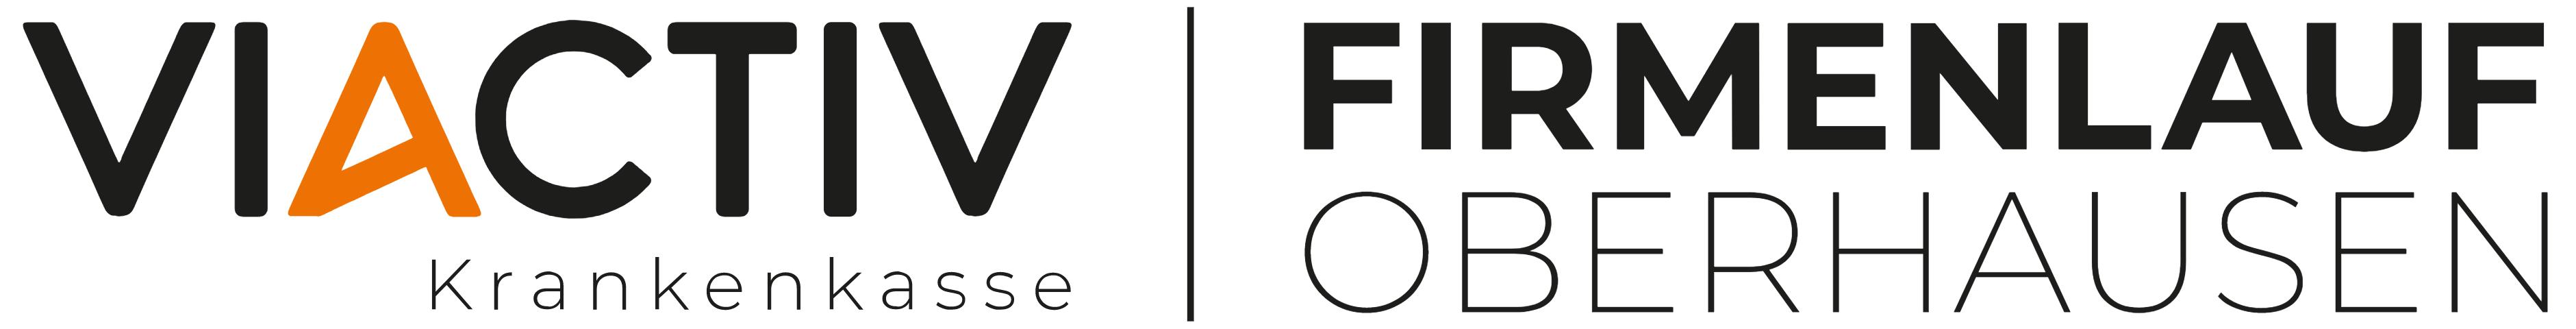 VIACTIV Firmenlauf Oberhausen Logo